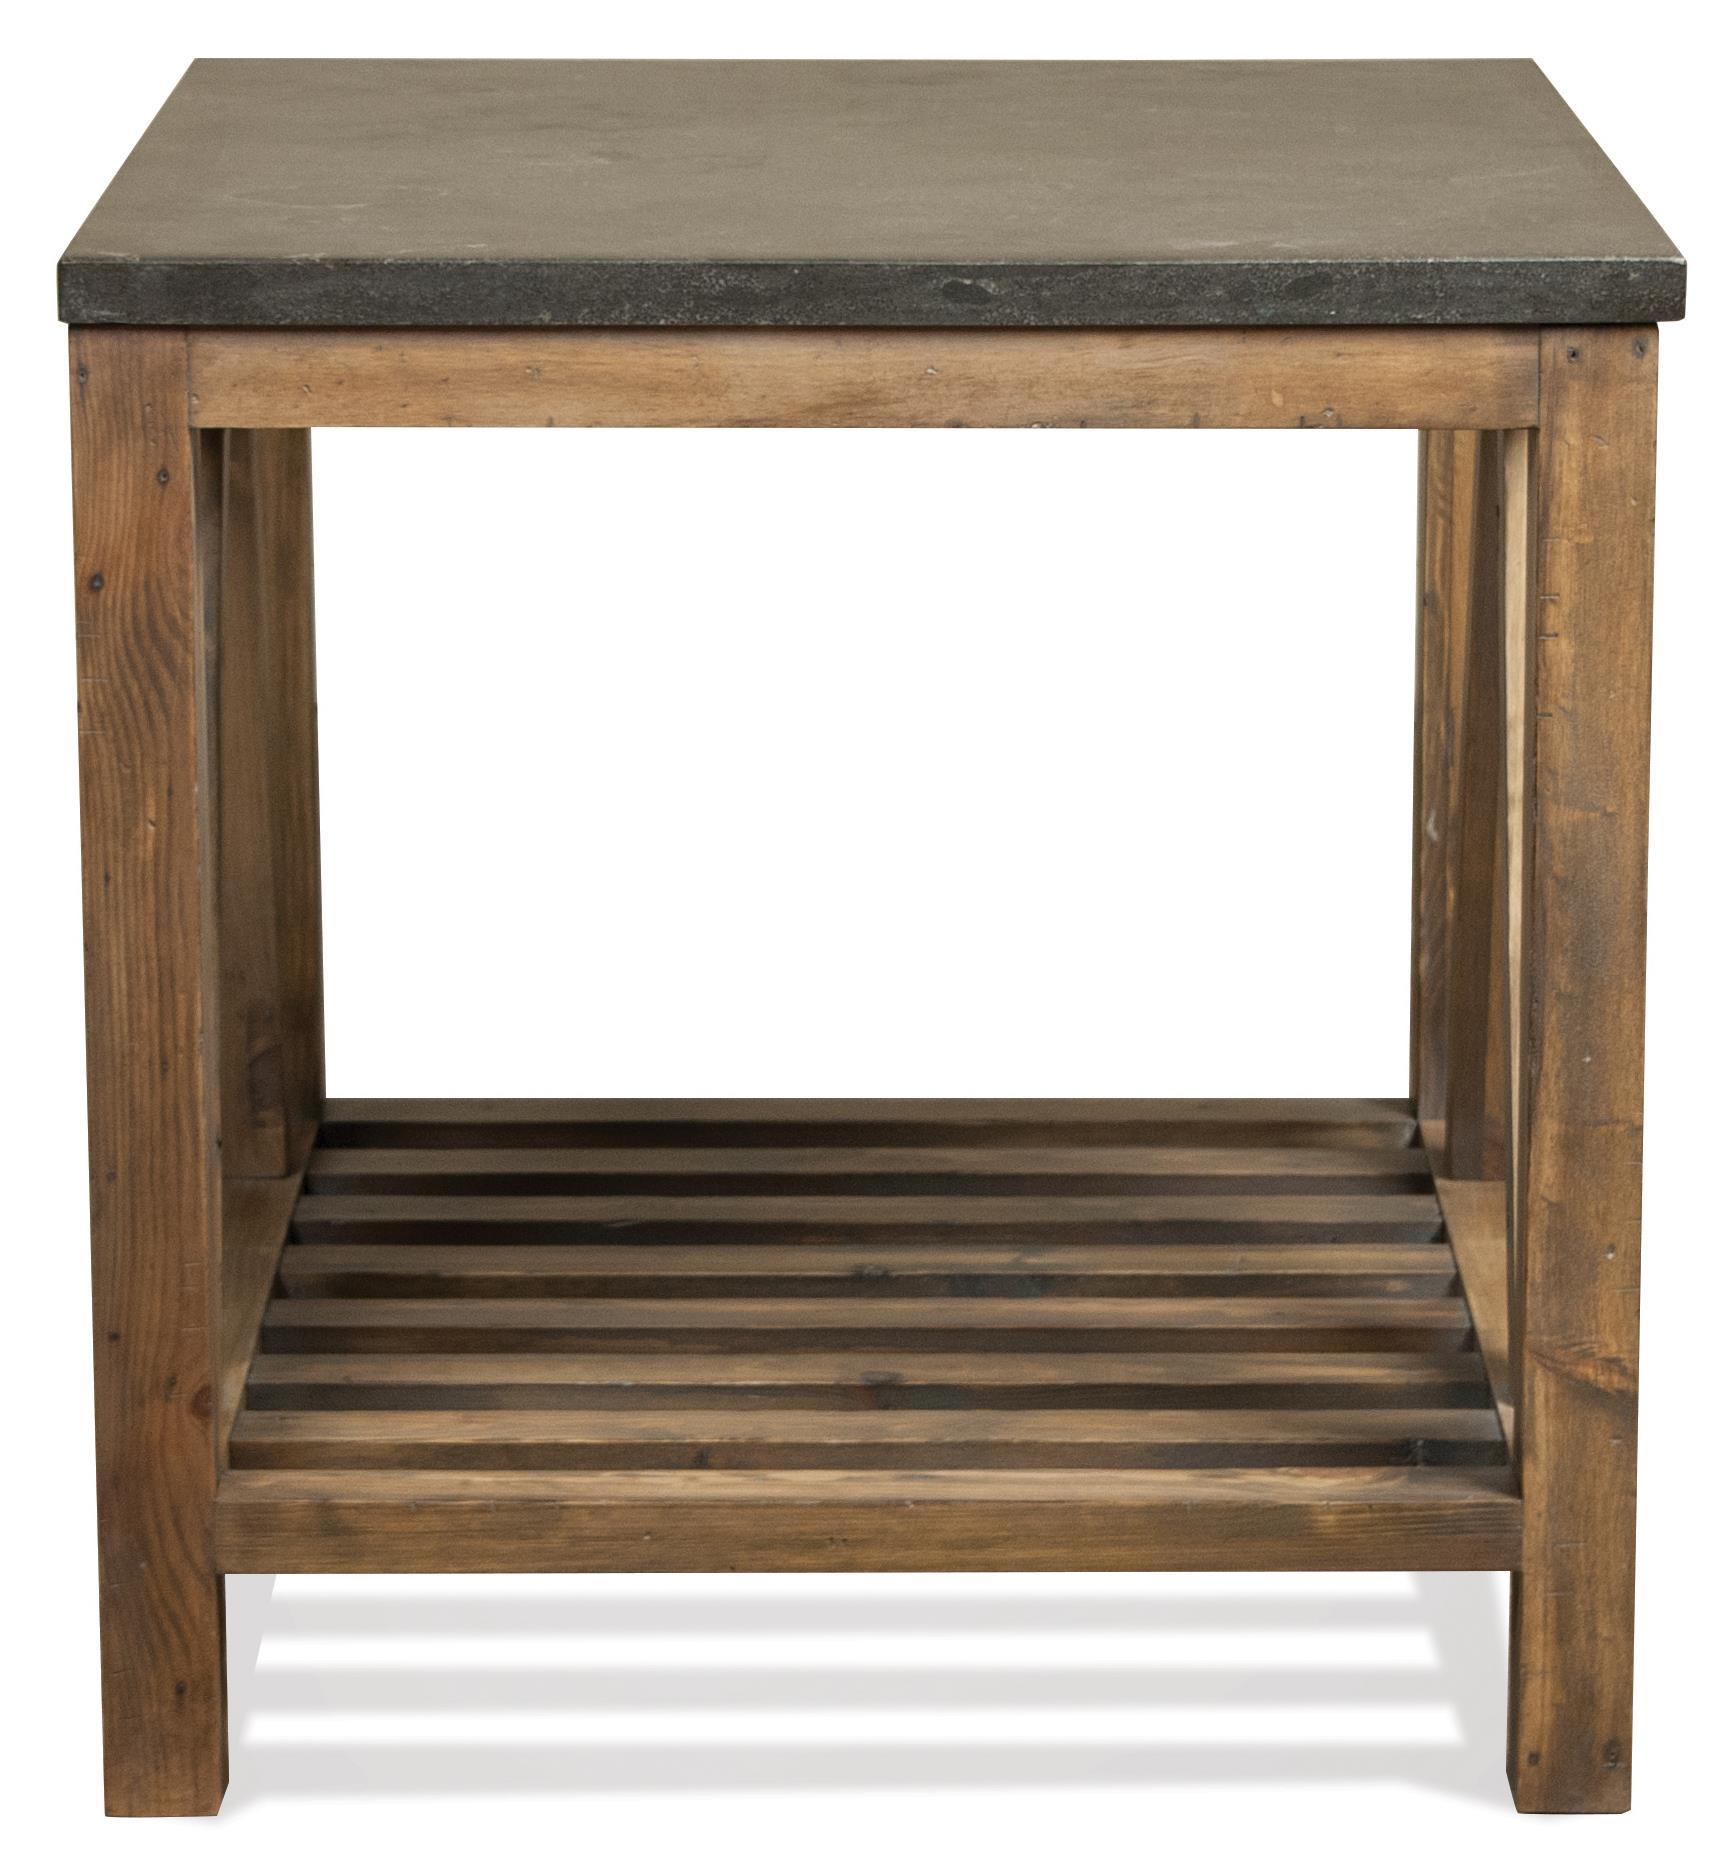 Riverside Furniture Weatherford Rectangular End Table   Item Number:  16509+10